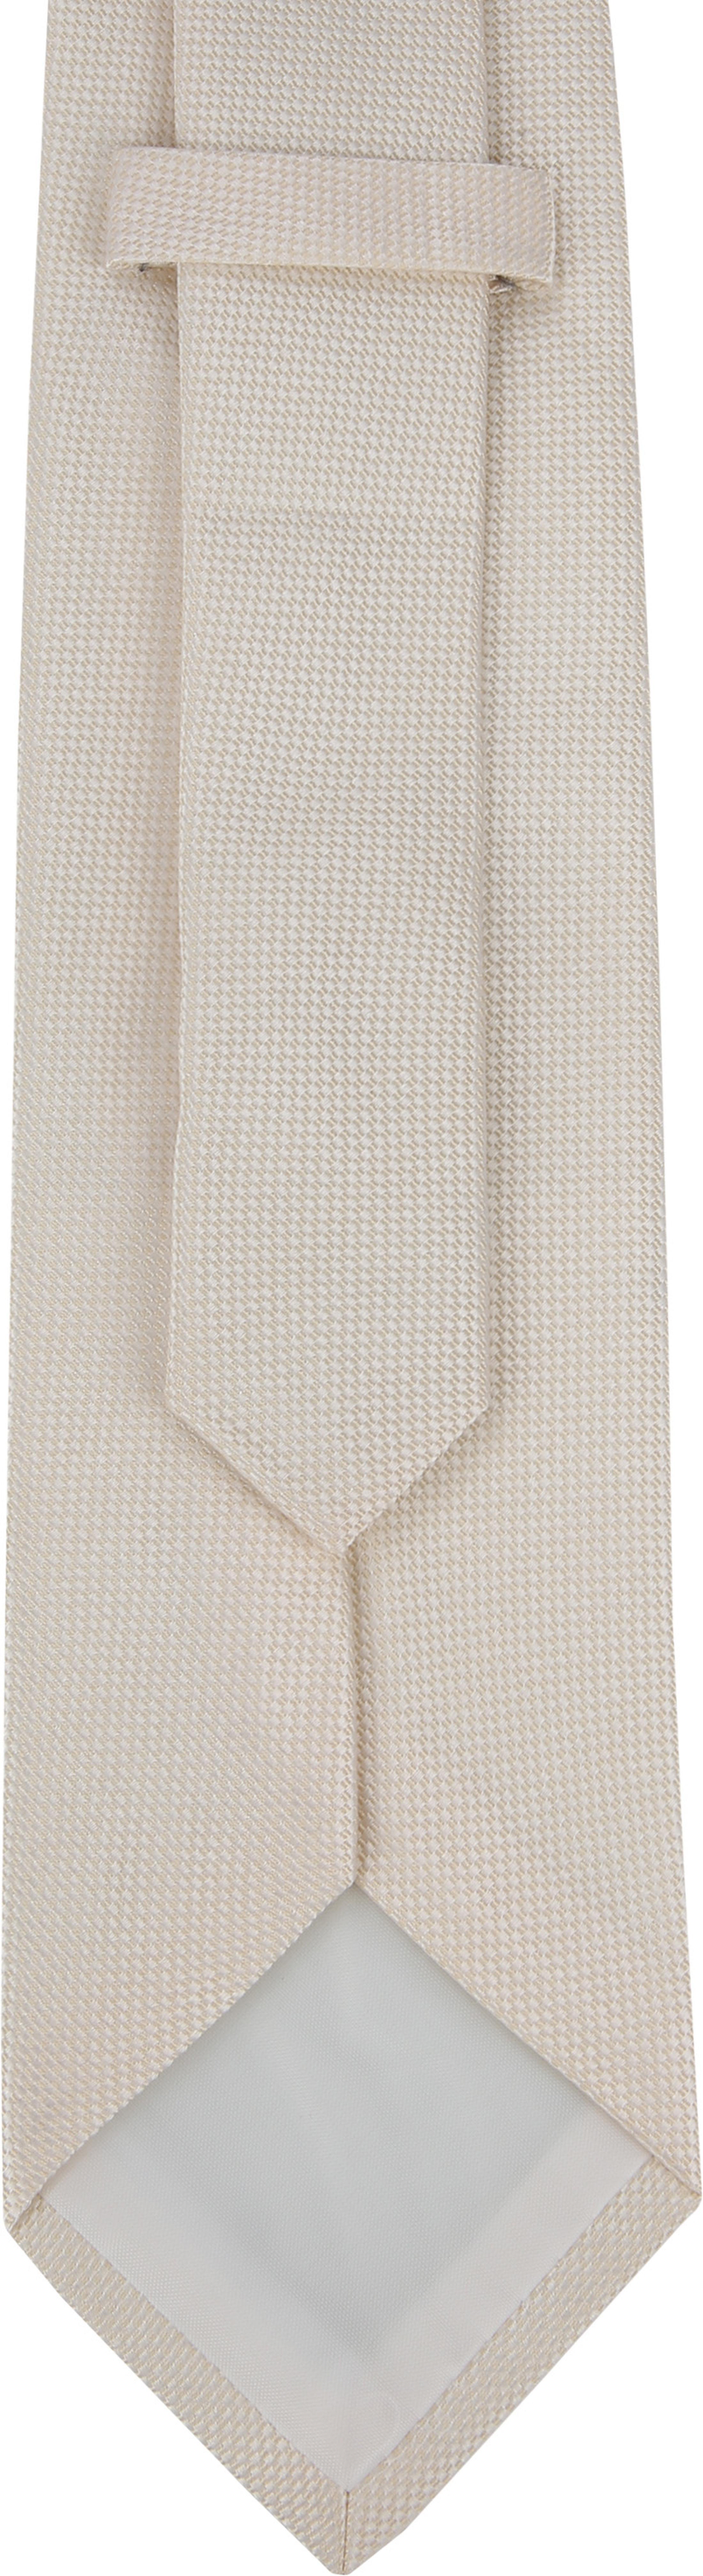 Suitable Krawatte Off-White foto 2